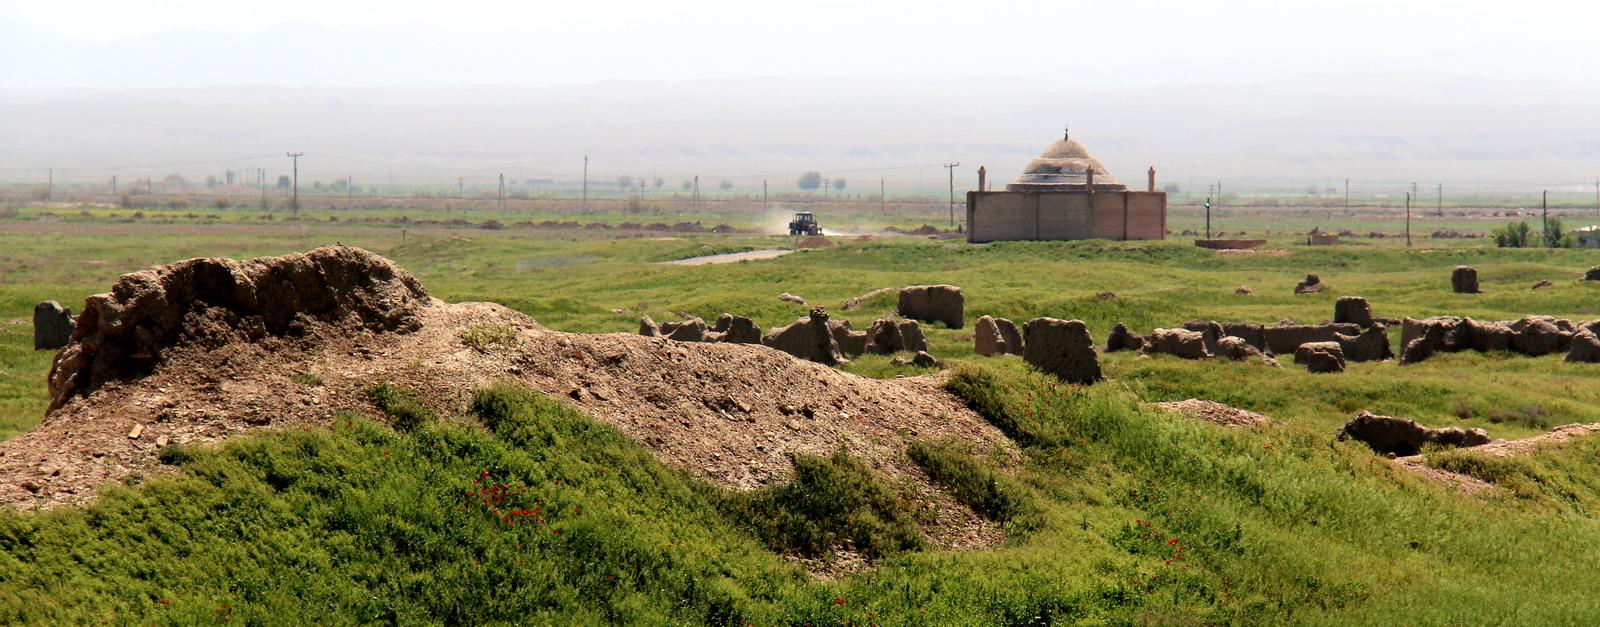 Nature, Turkmenistan (5)